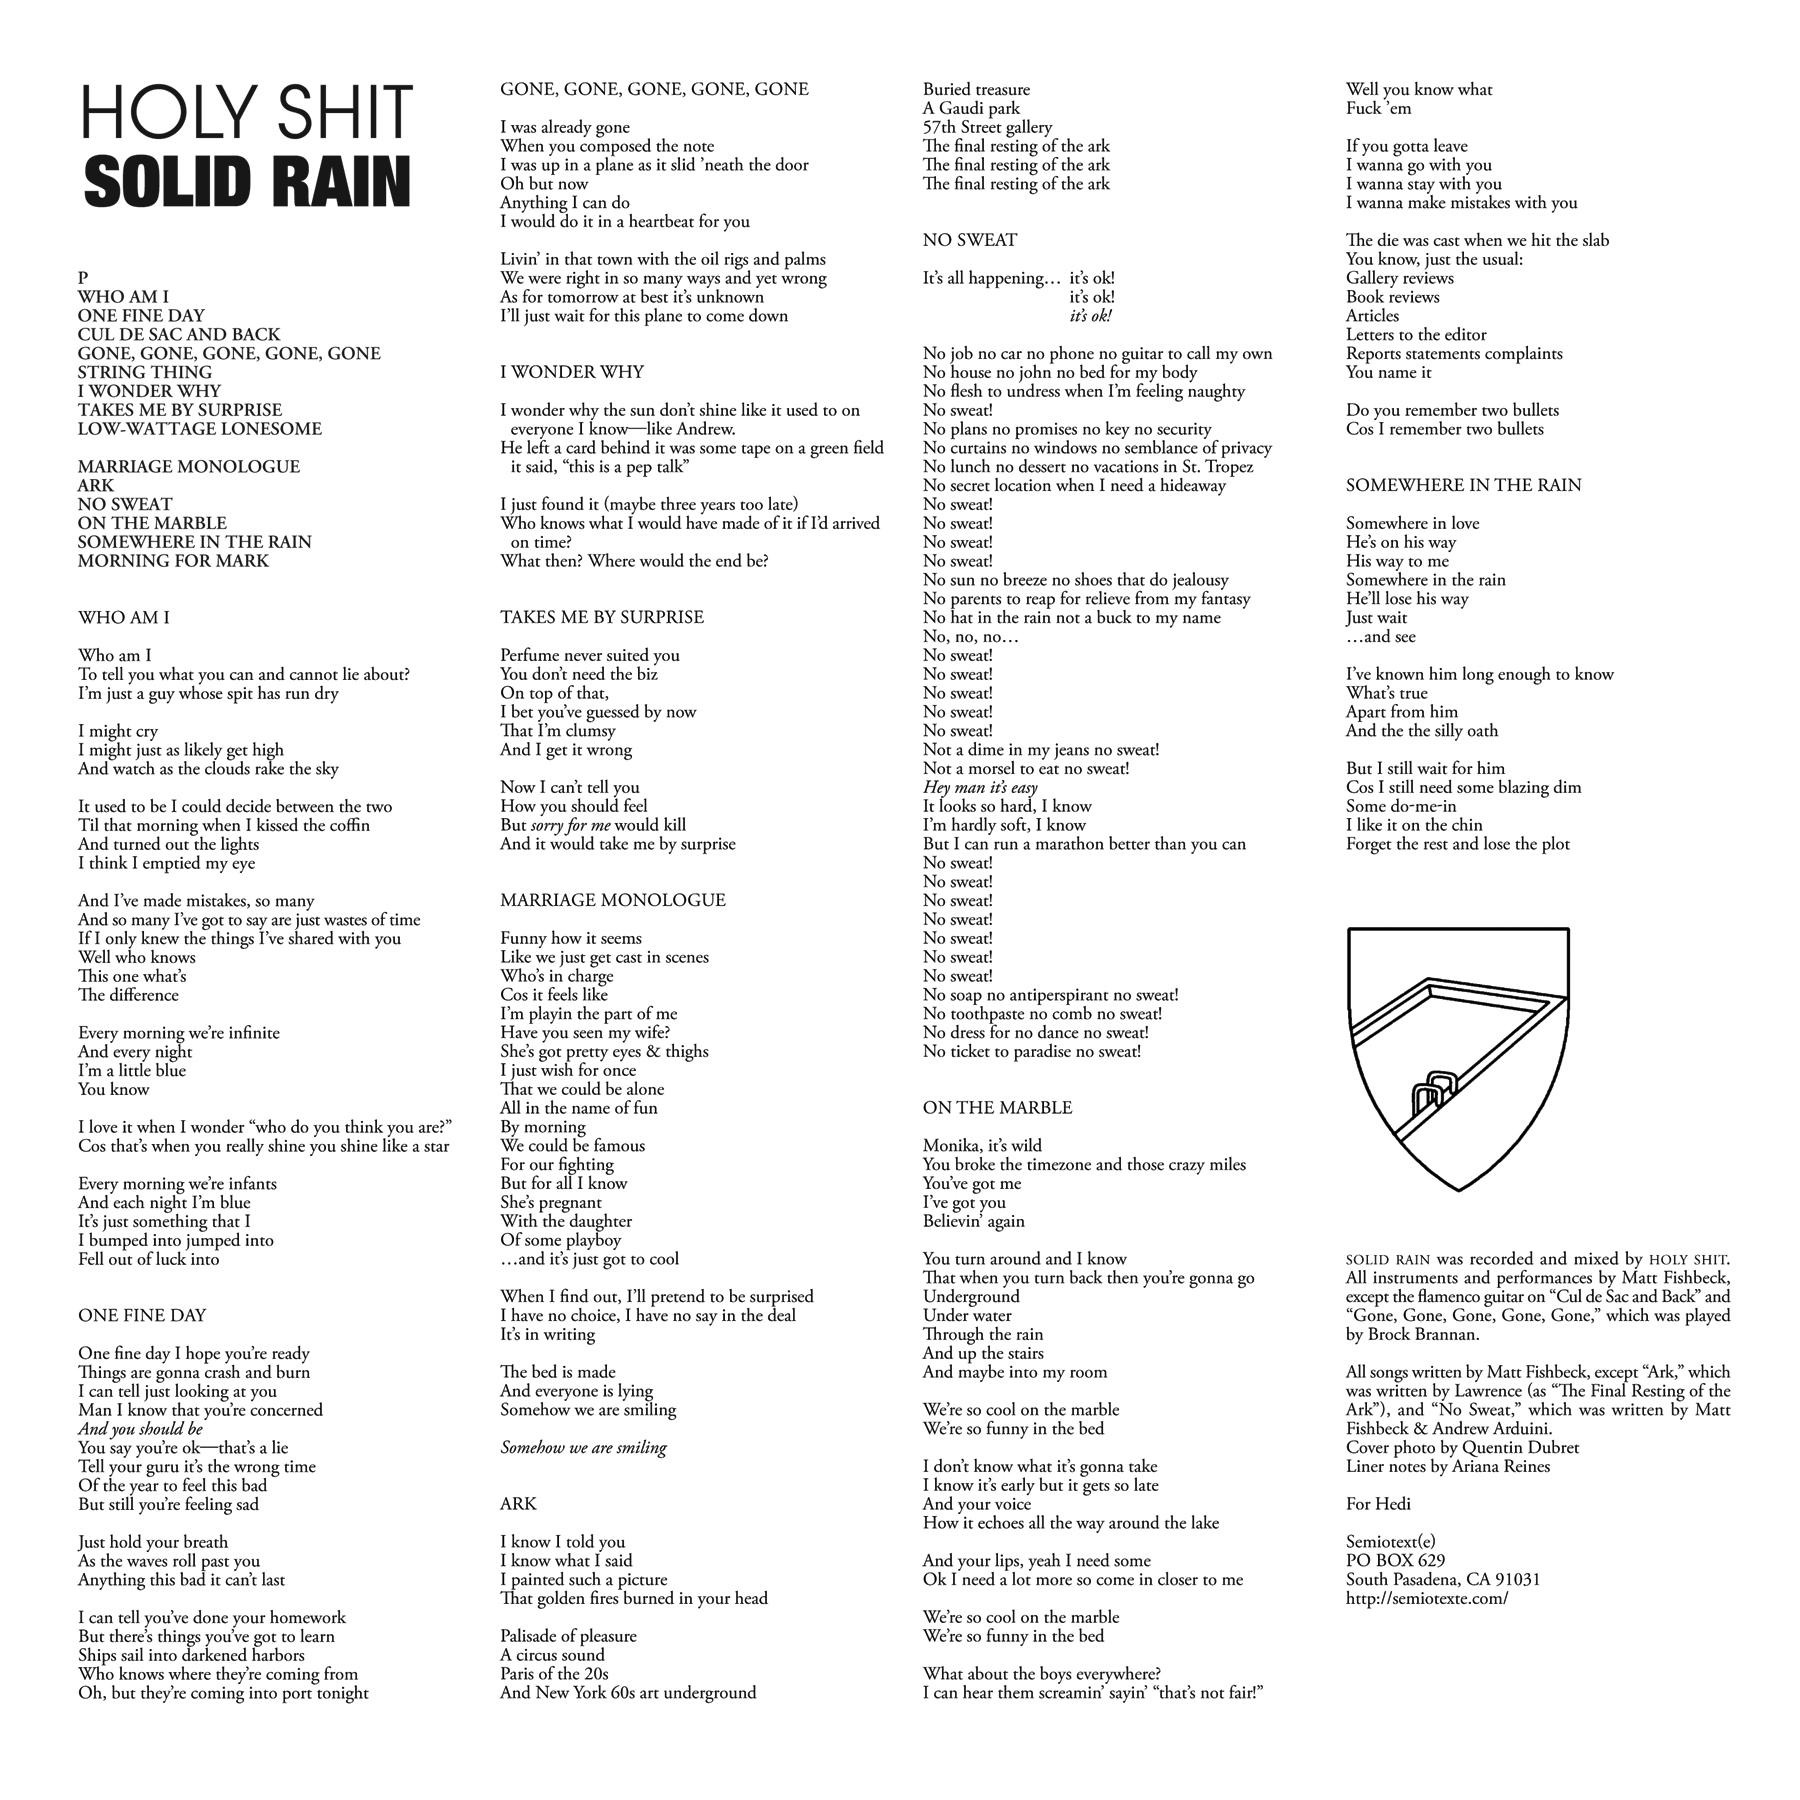 Holy Shit: Solid Rain — Semiotext(e)